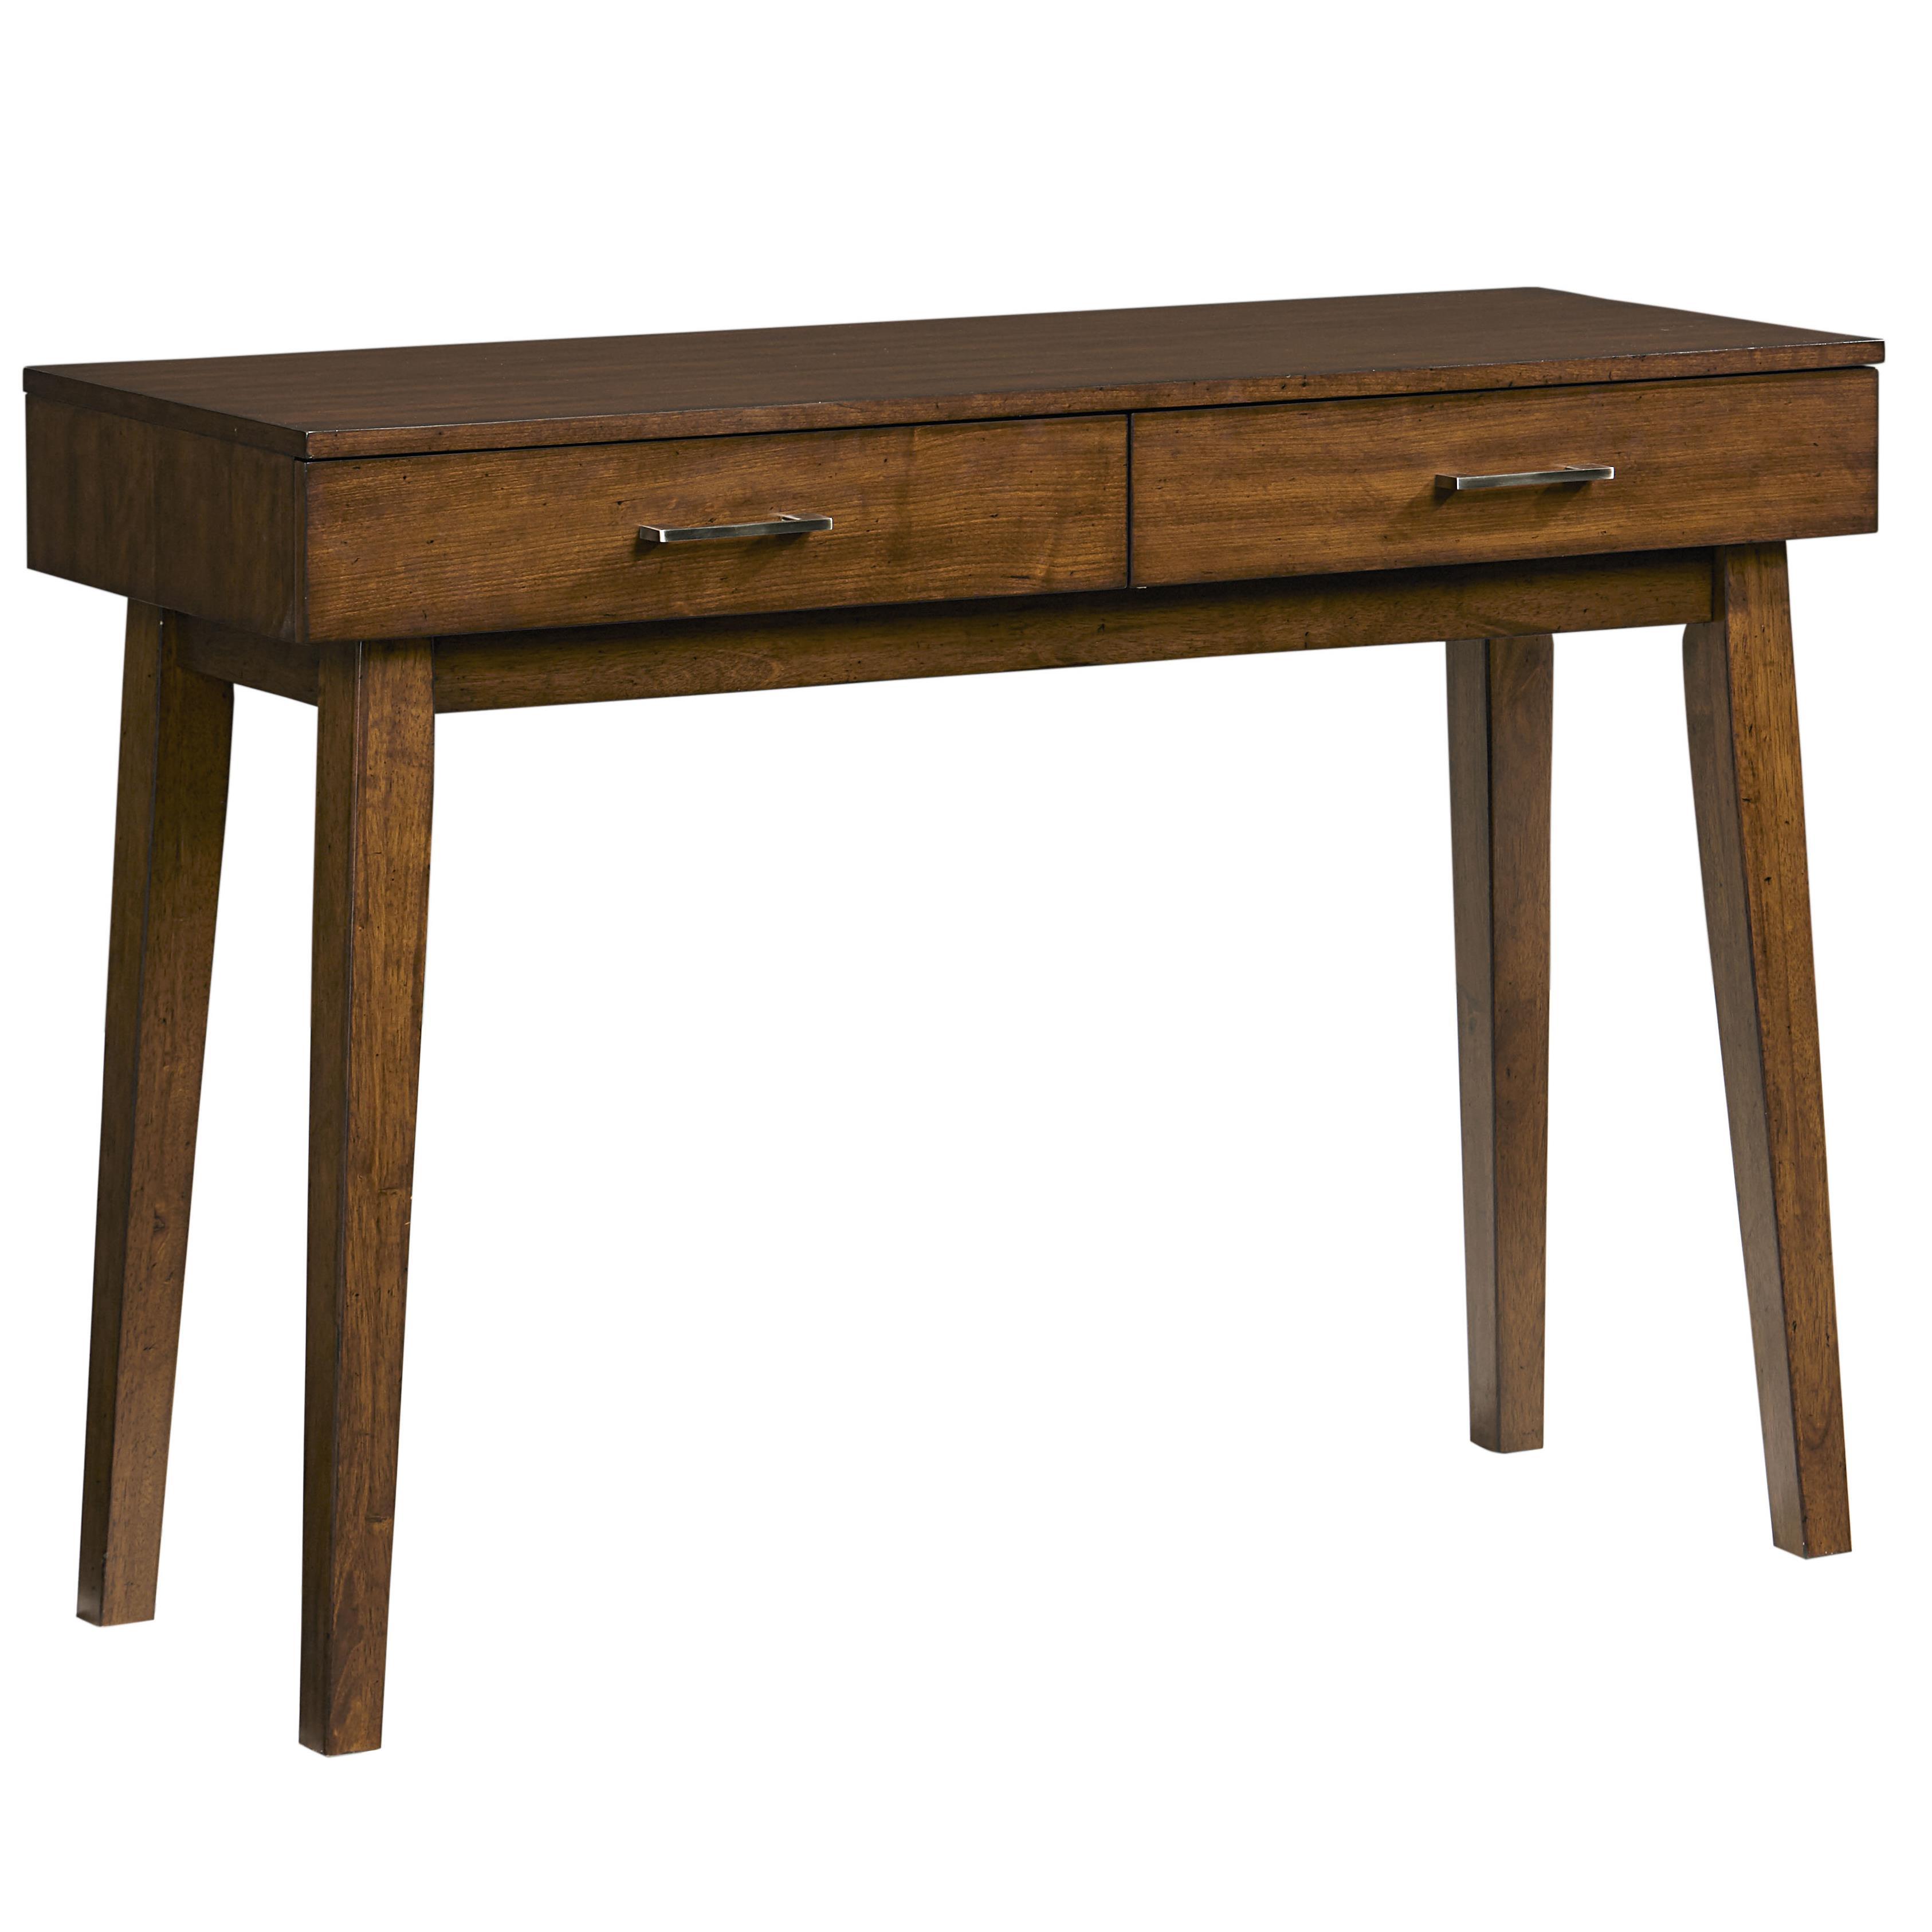 Standard Furniture Miranda Sideboard                                - Item Number: 13648